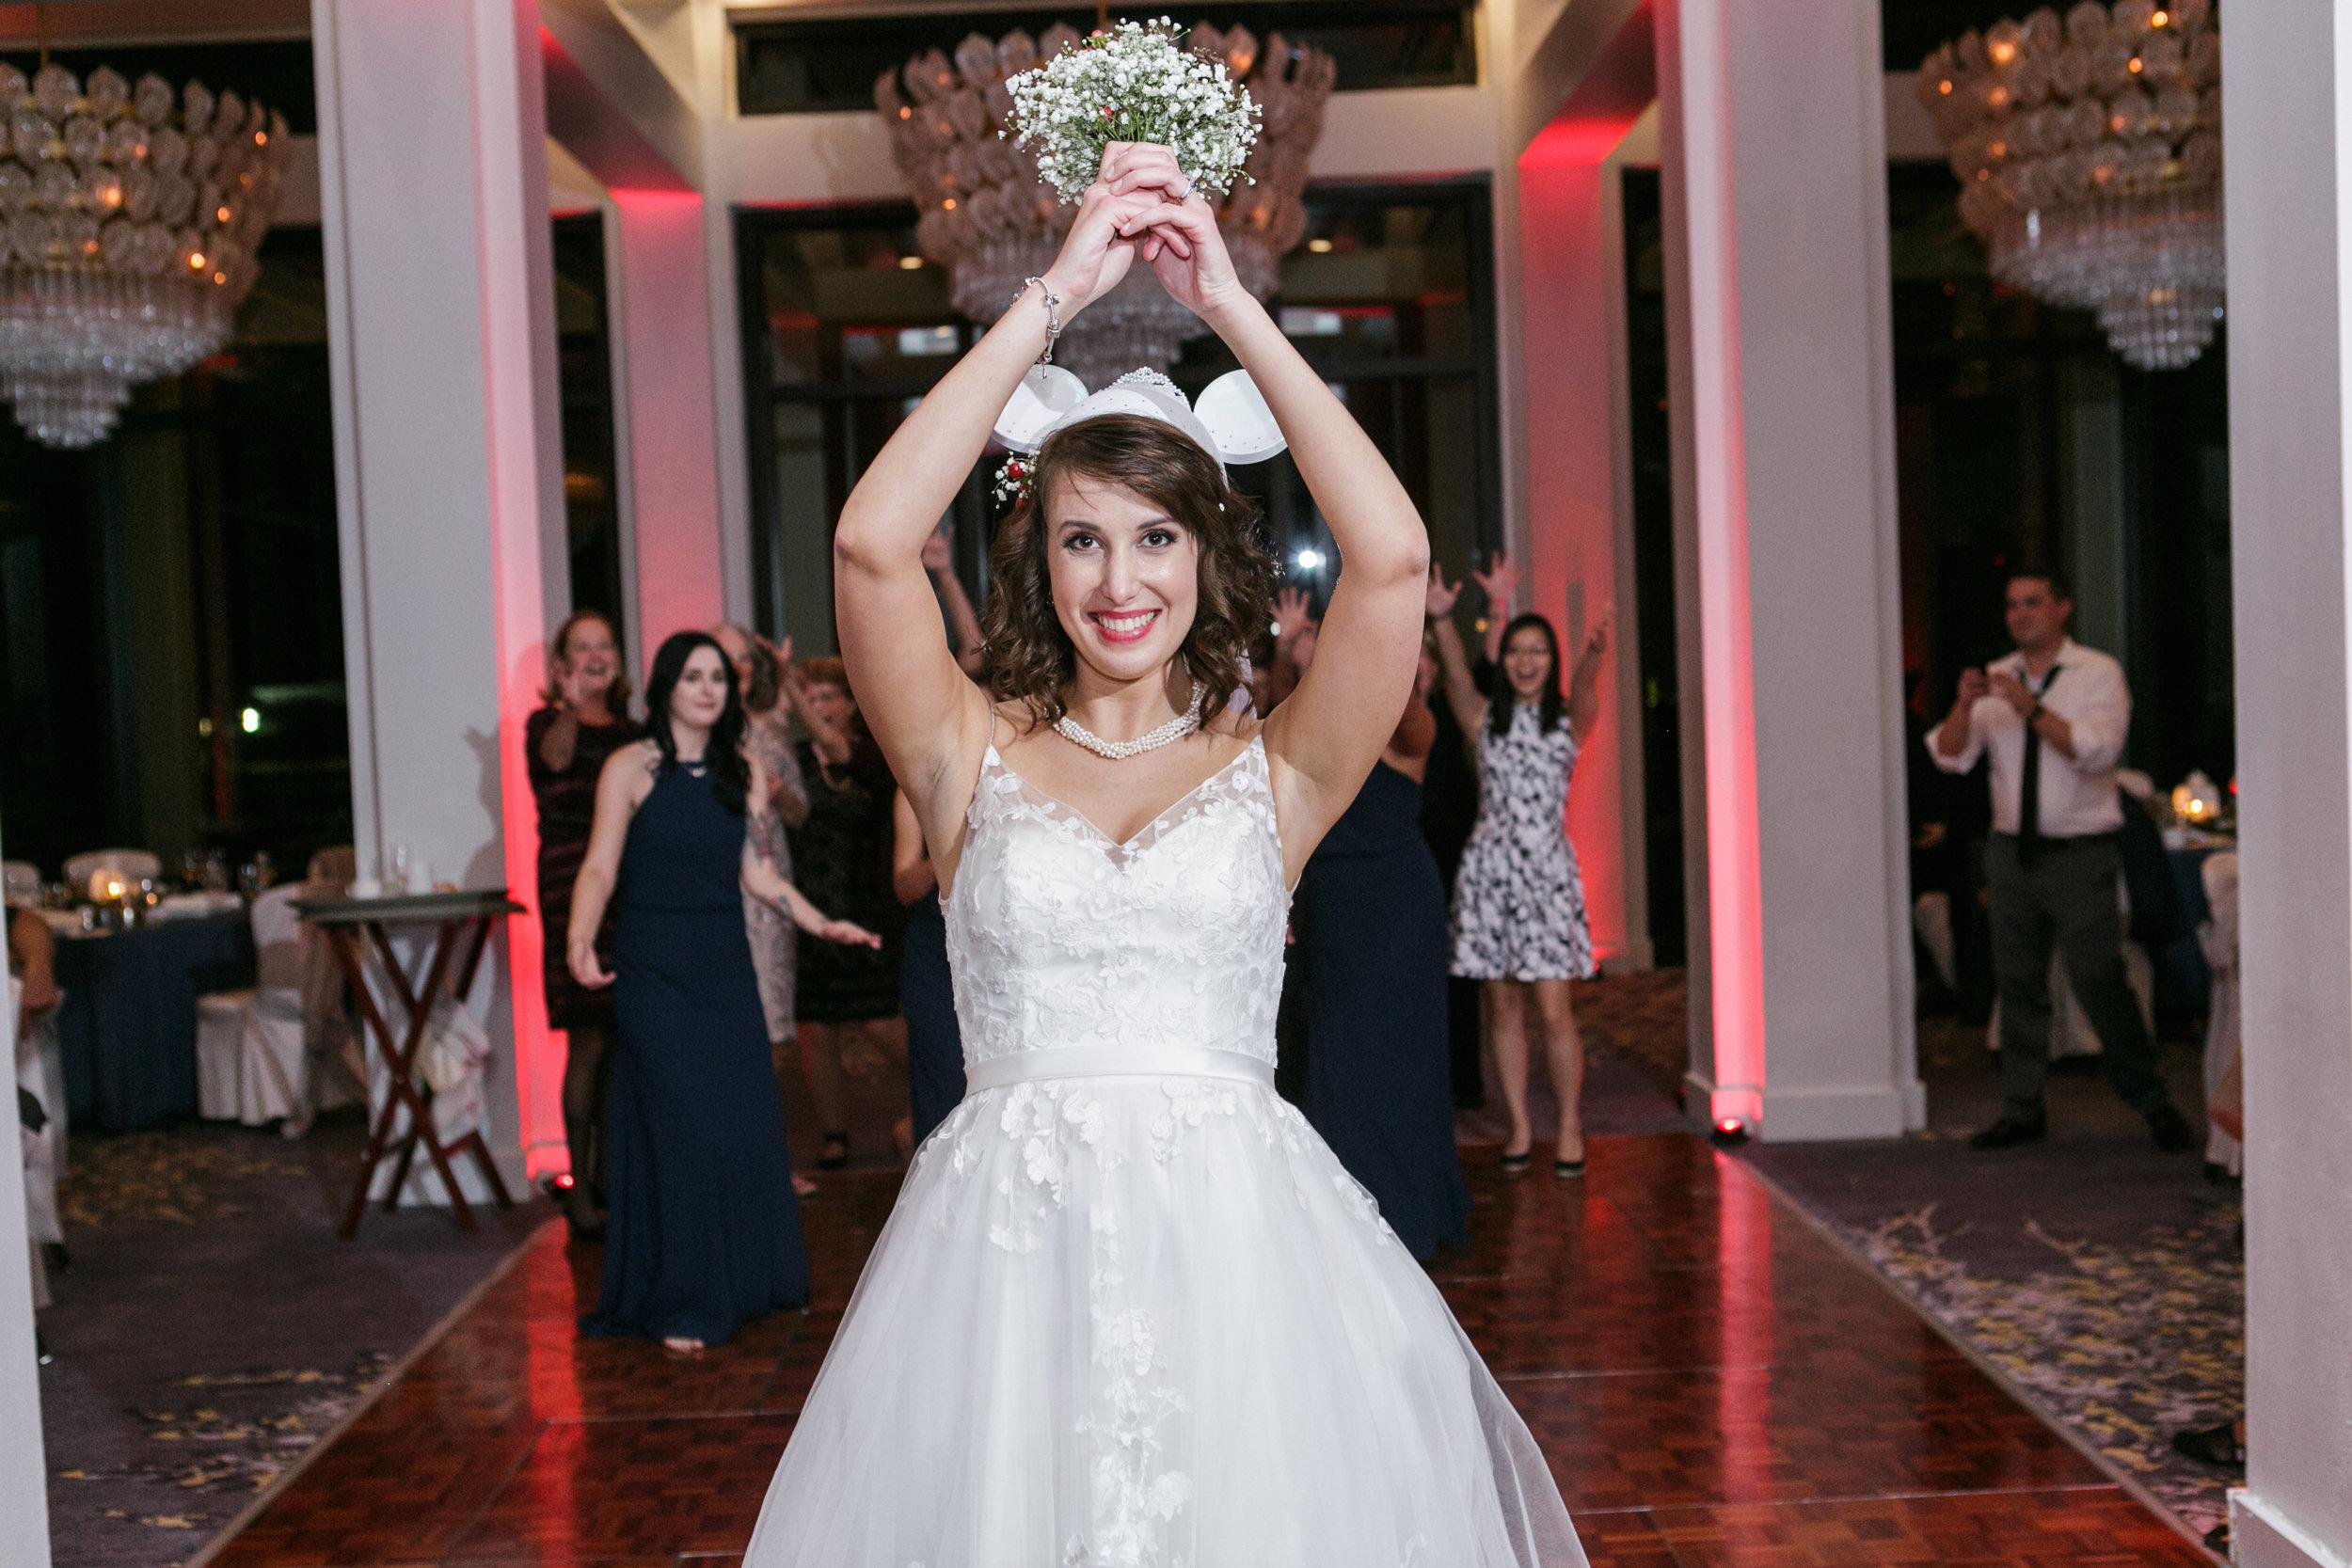 Bluegrass Chic - Bumby Photography - Bridal Toss Bouquet